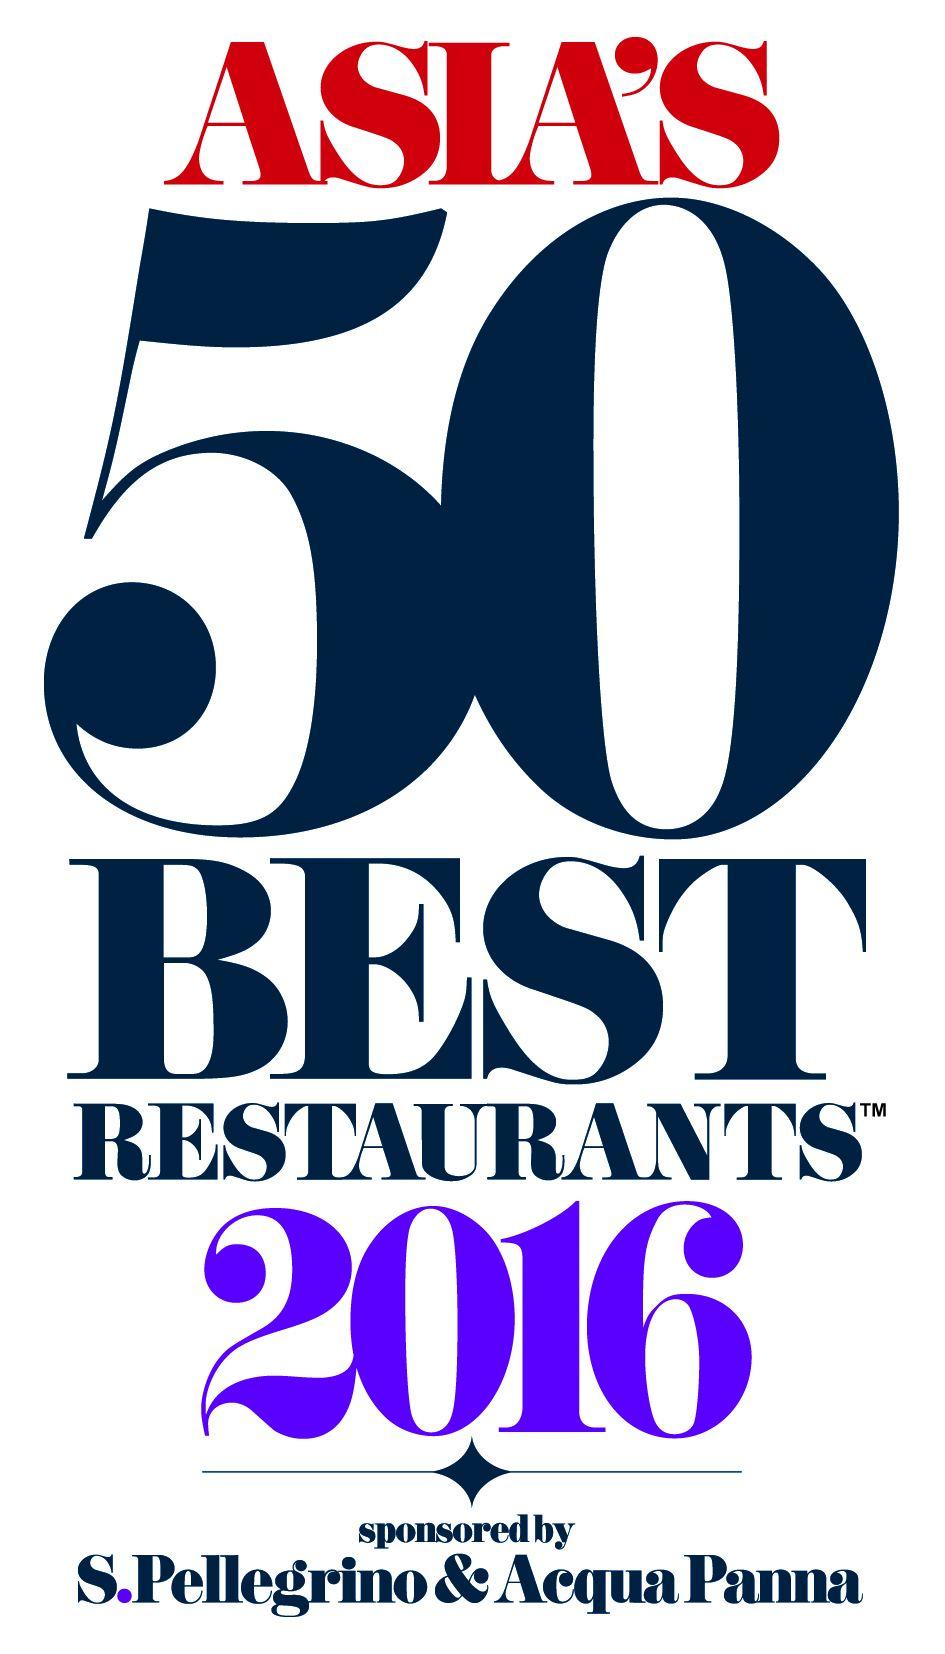 Asia's Best Restaurants 2016